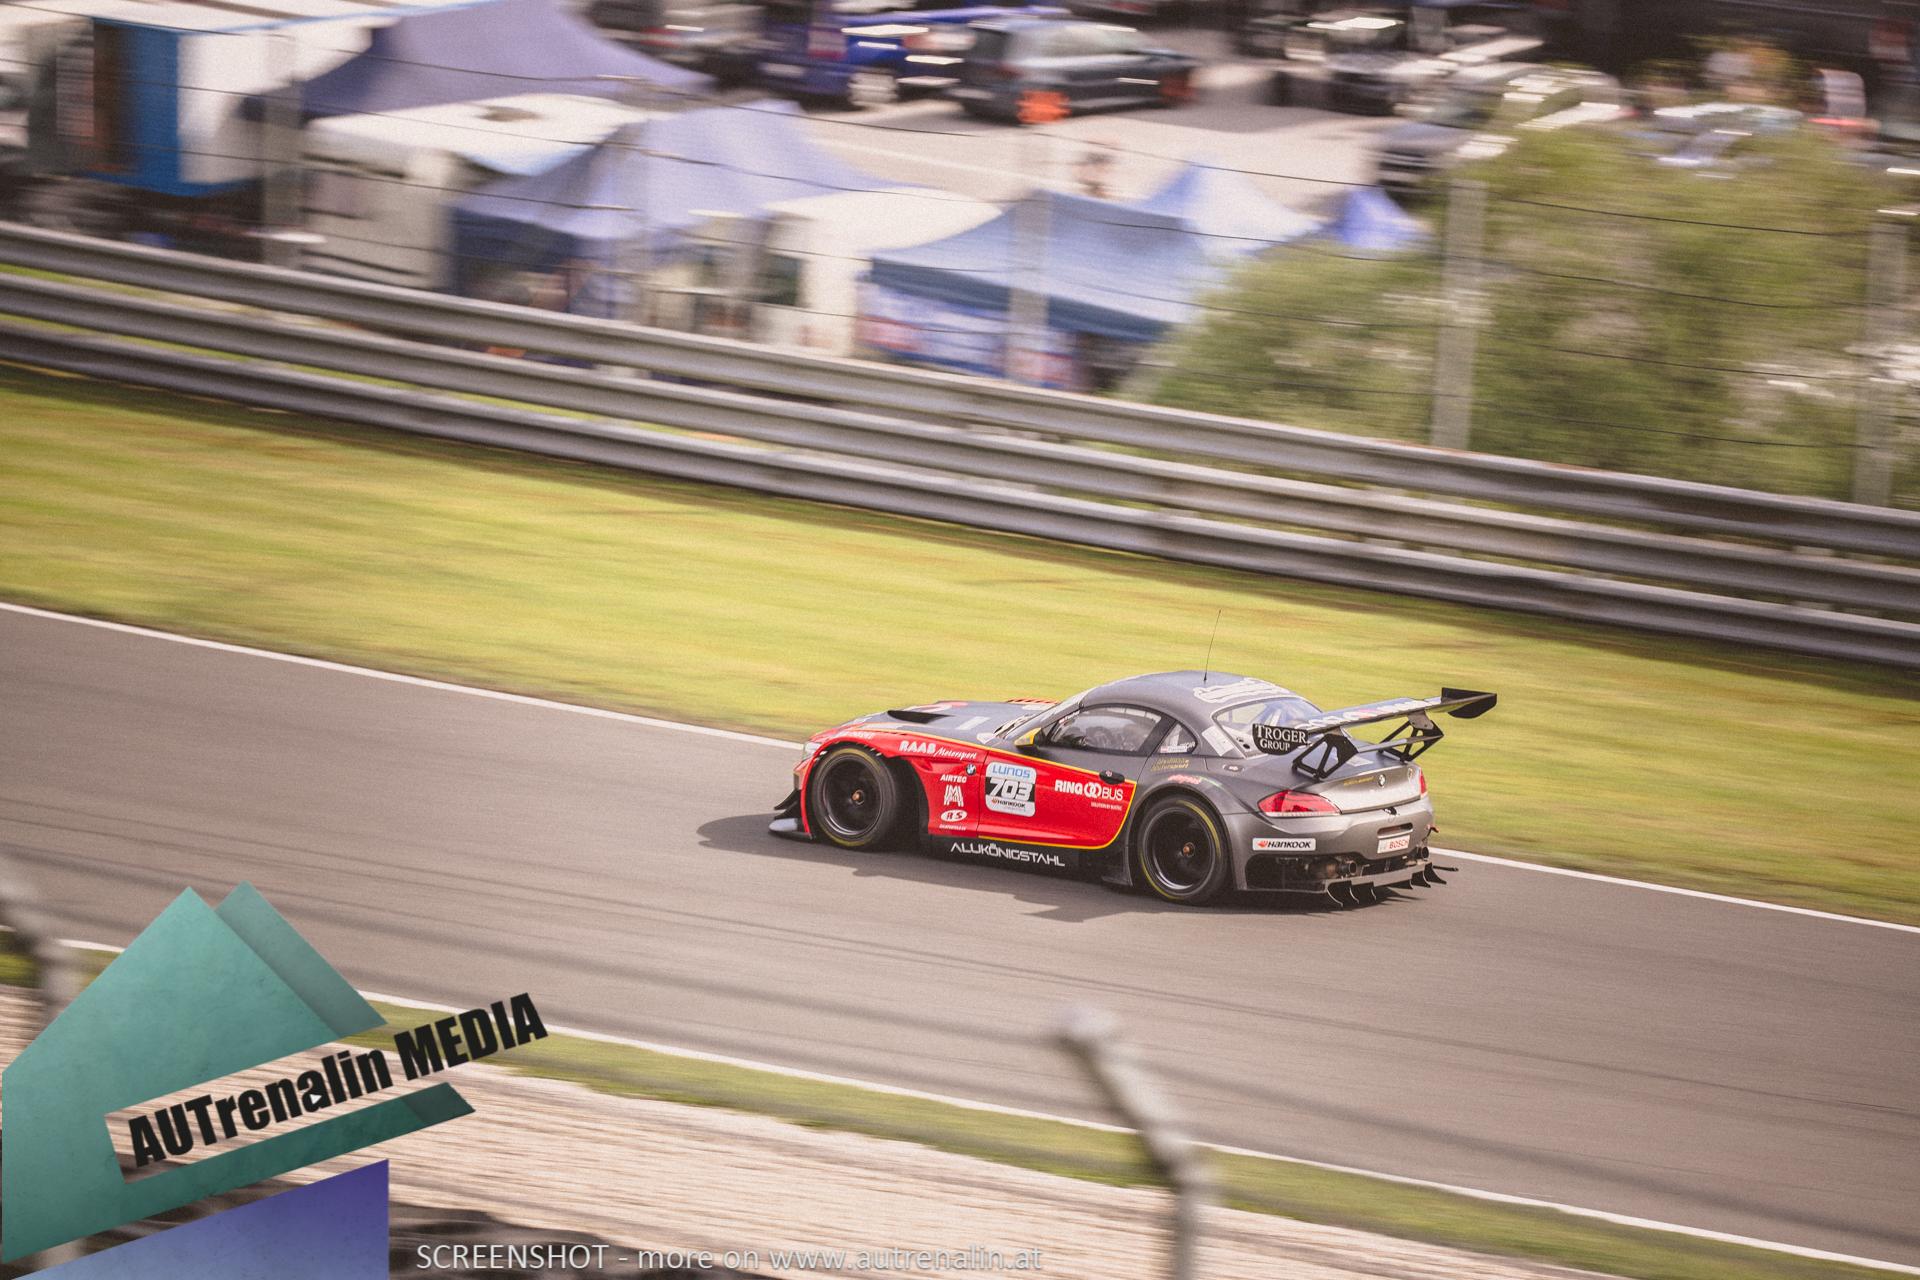 SportwagenCup_Salzburgring-Mai-2018_AUTrenalinMEDIA_web-6732.jpg